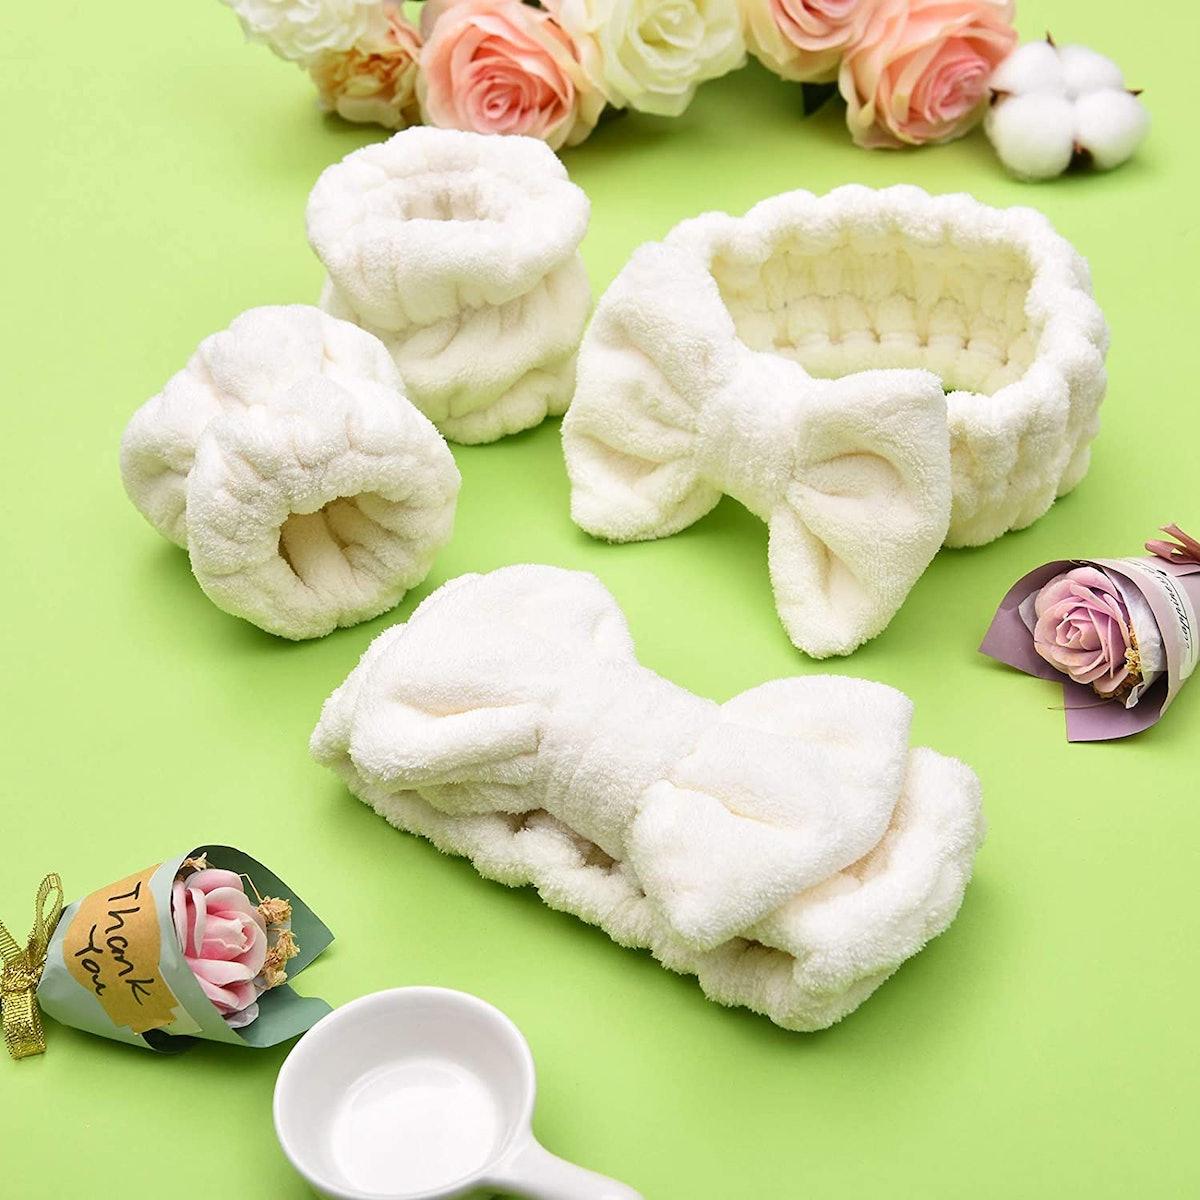 Chuangdi Spa Washband Set (4 Pieces)